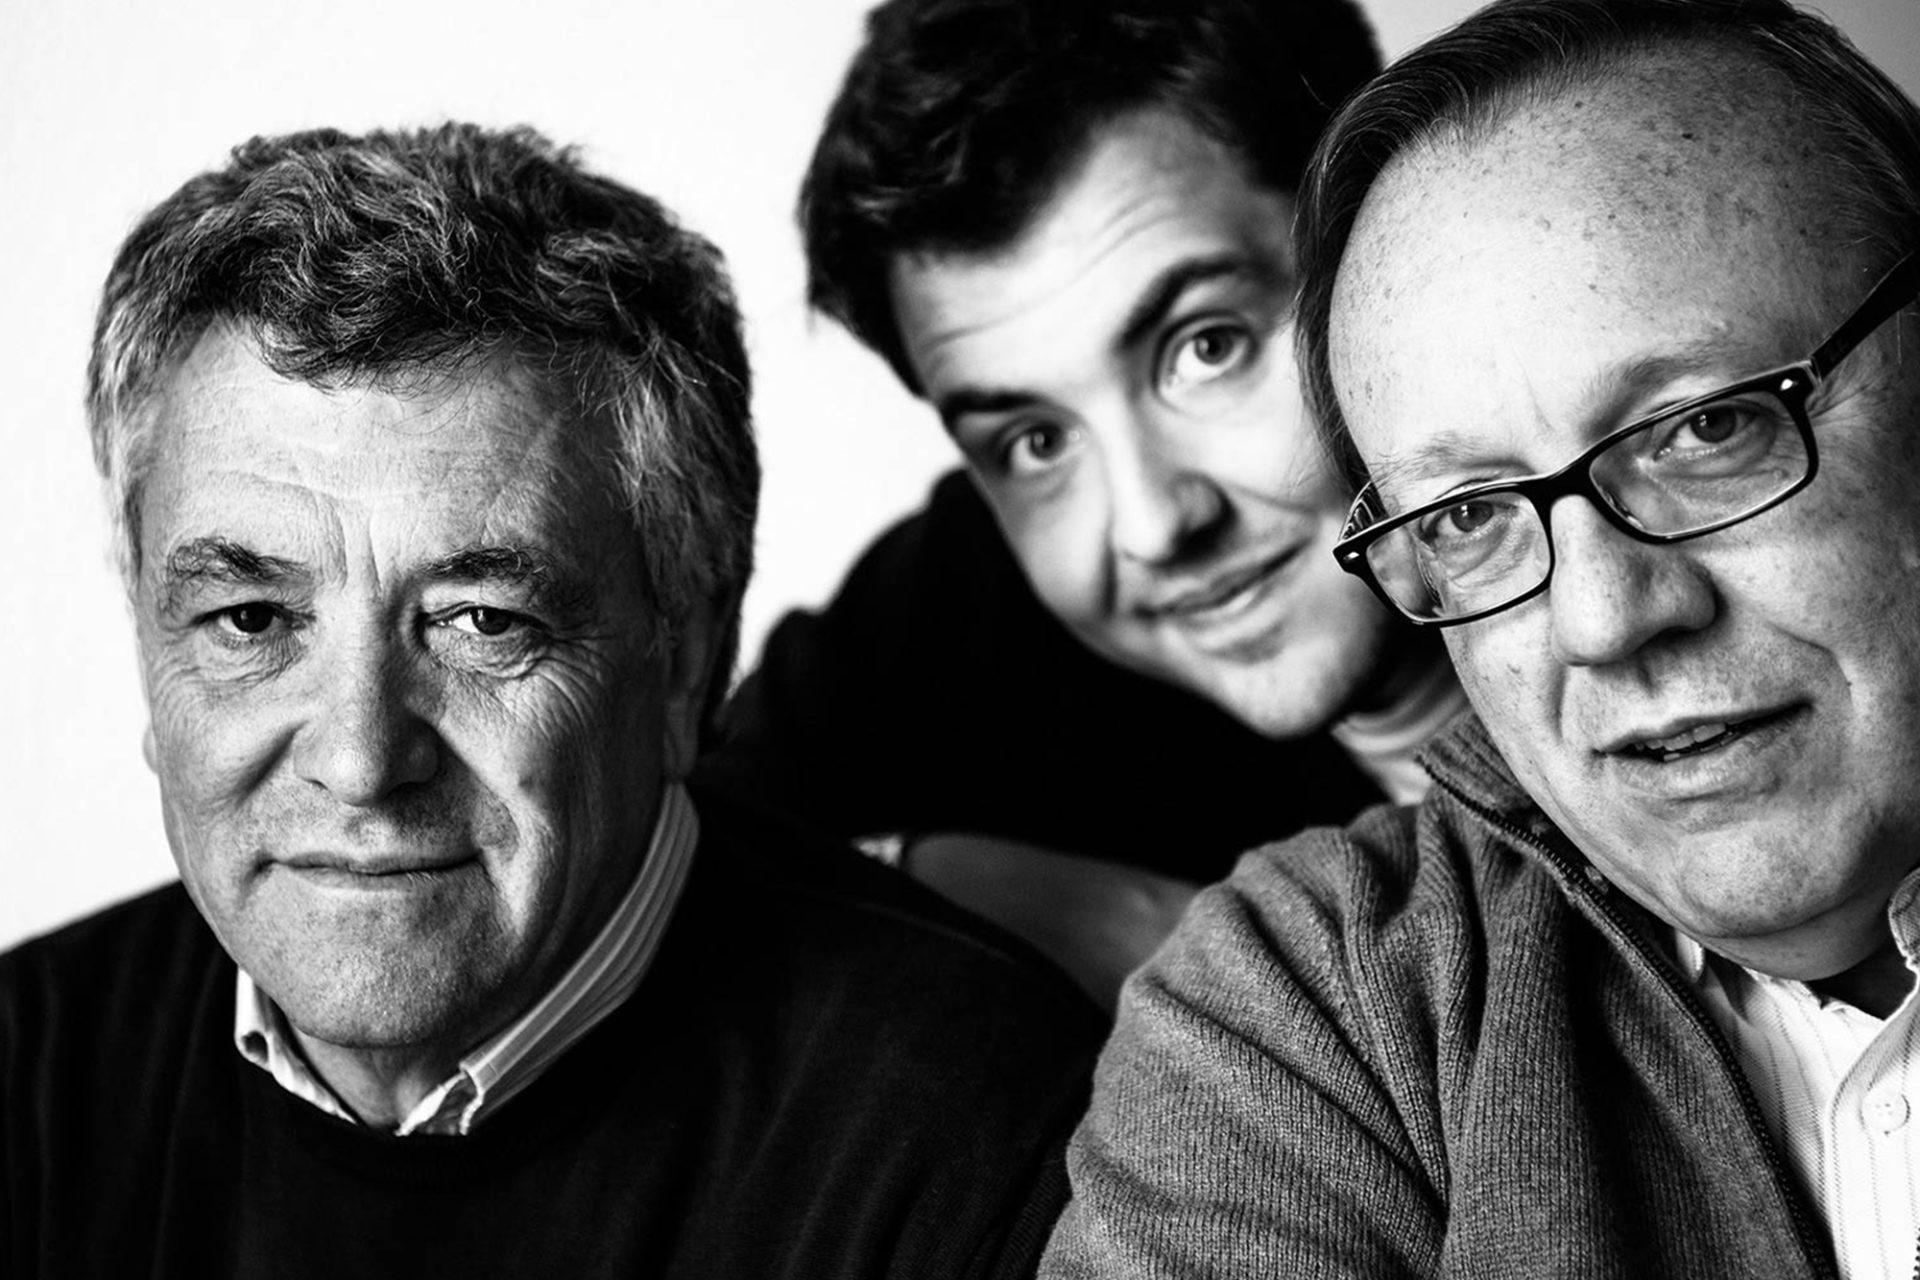 Trediberri - Federico Oberto, Nicola Oberto et Vladimiro Rambaldi)